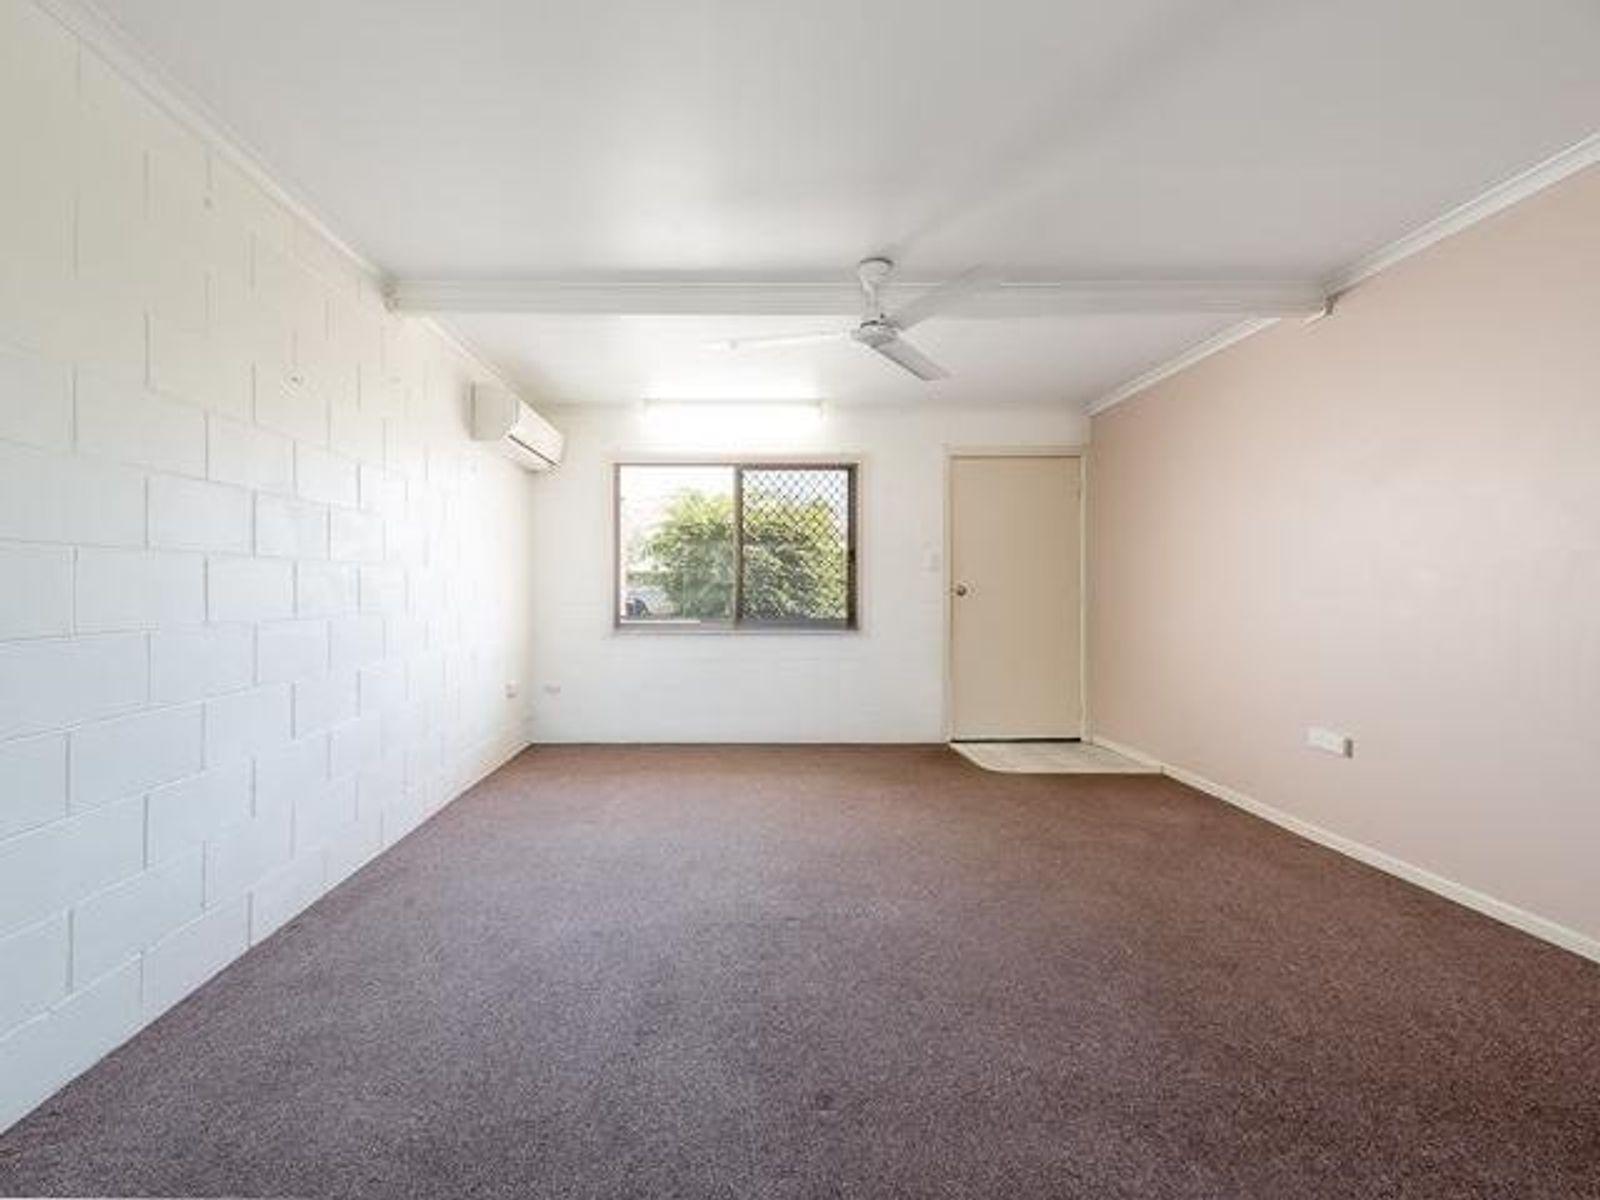 2/4 Graves Street, North Mackay, QLD 4740